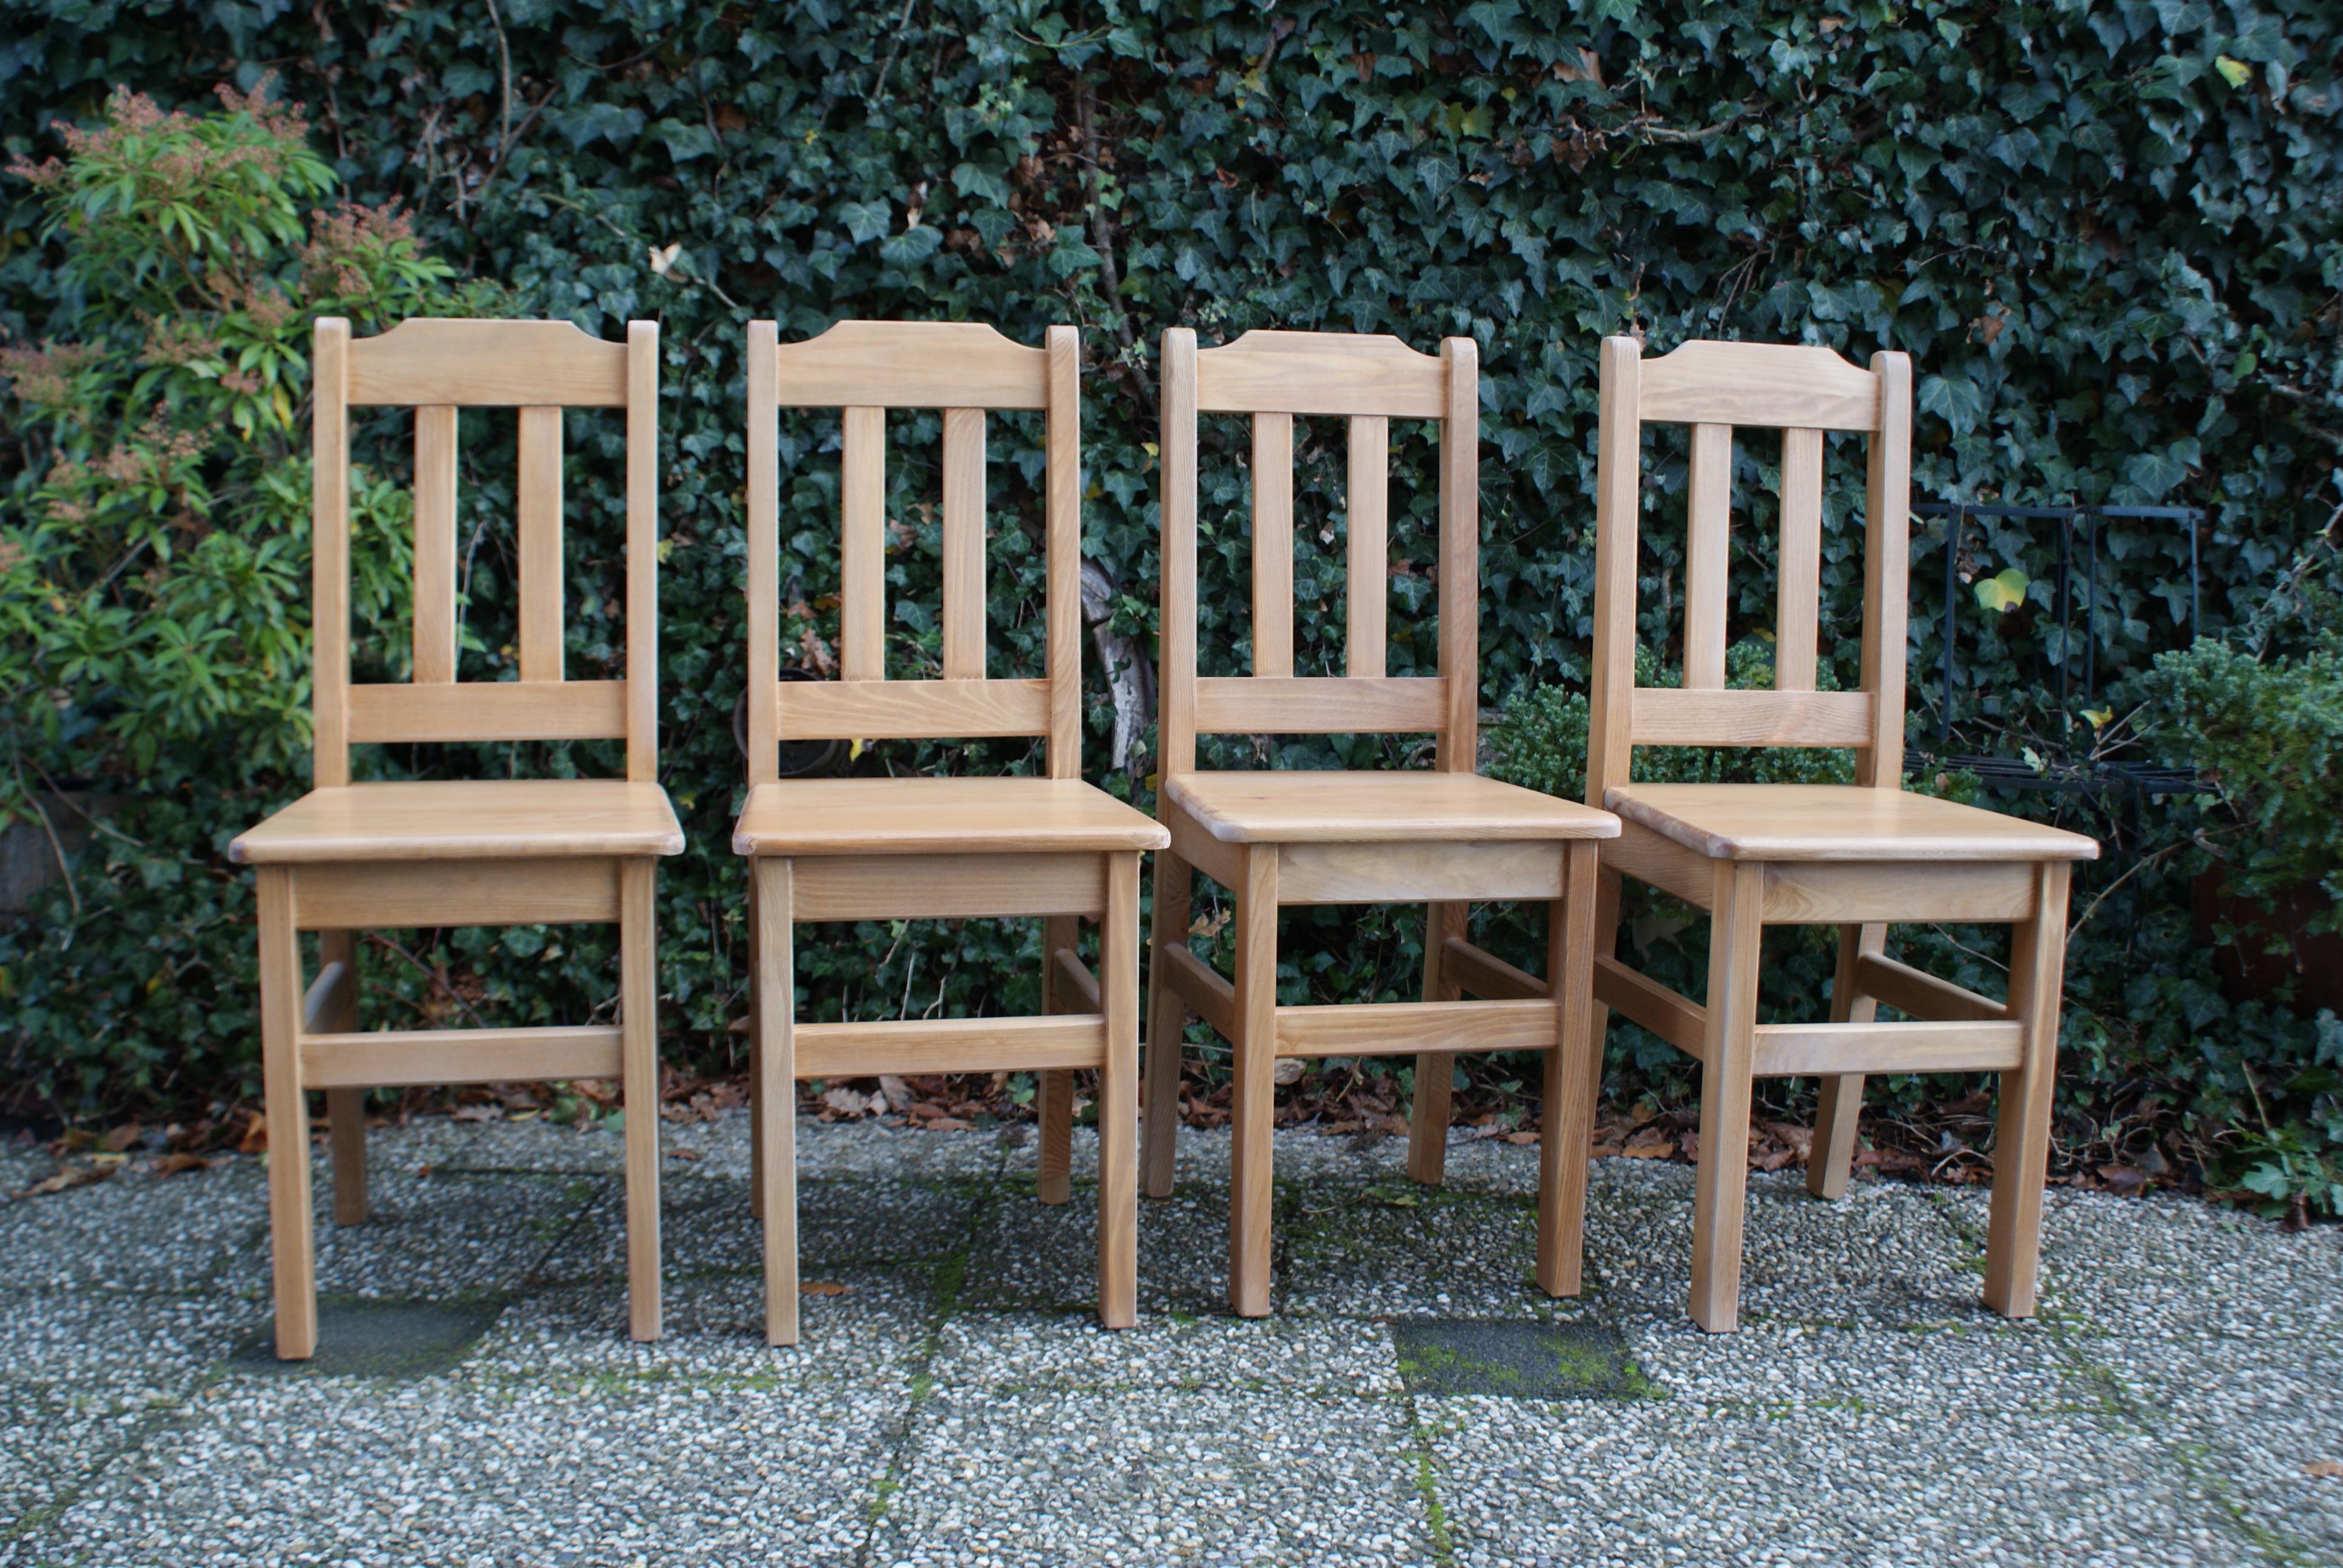 Grenenhouten stoelen